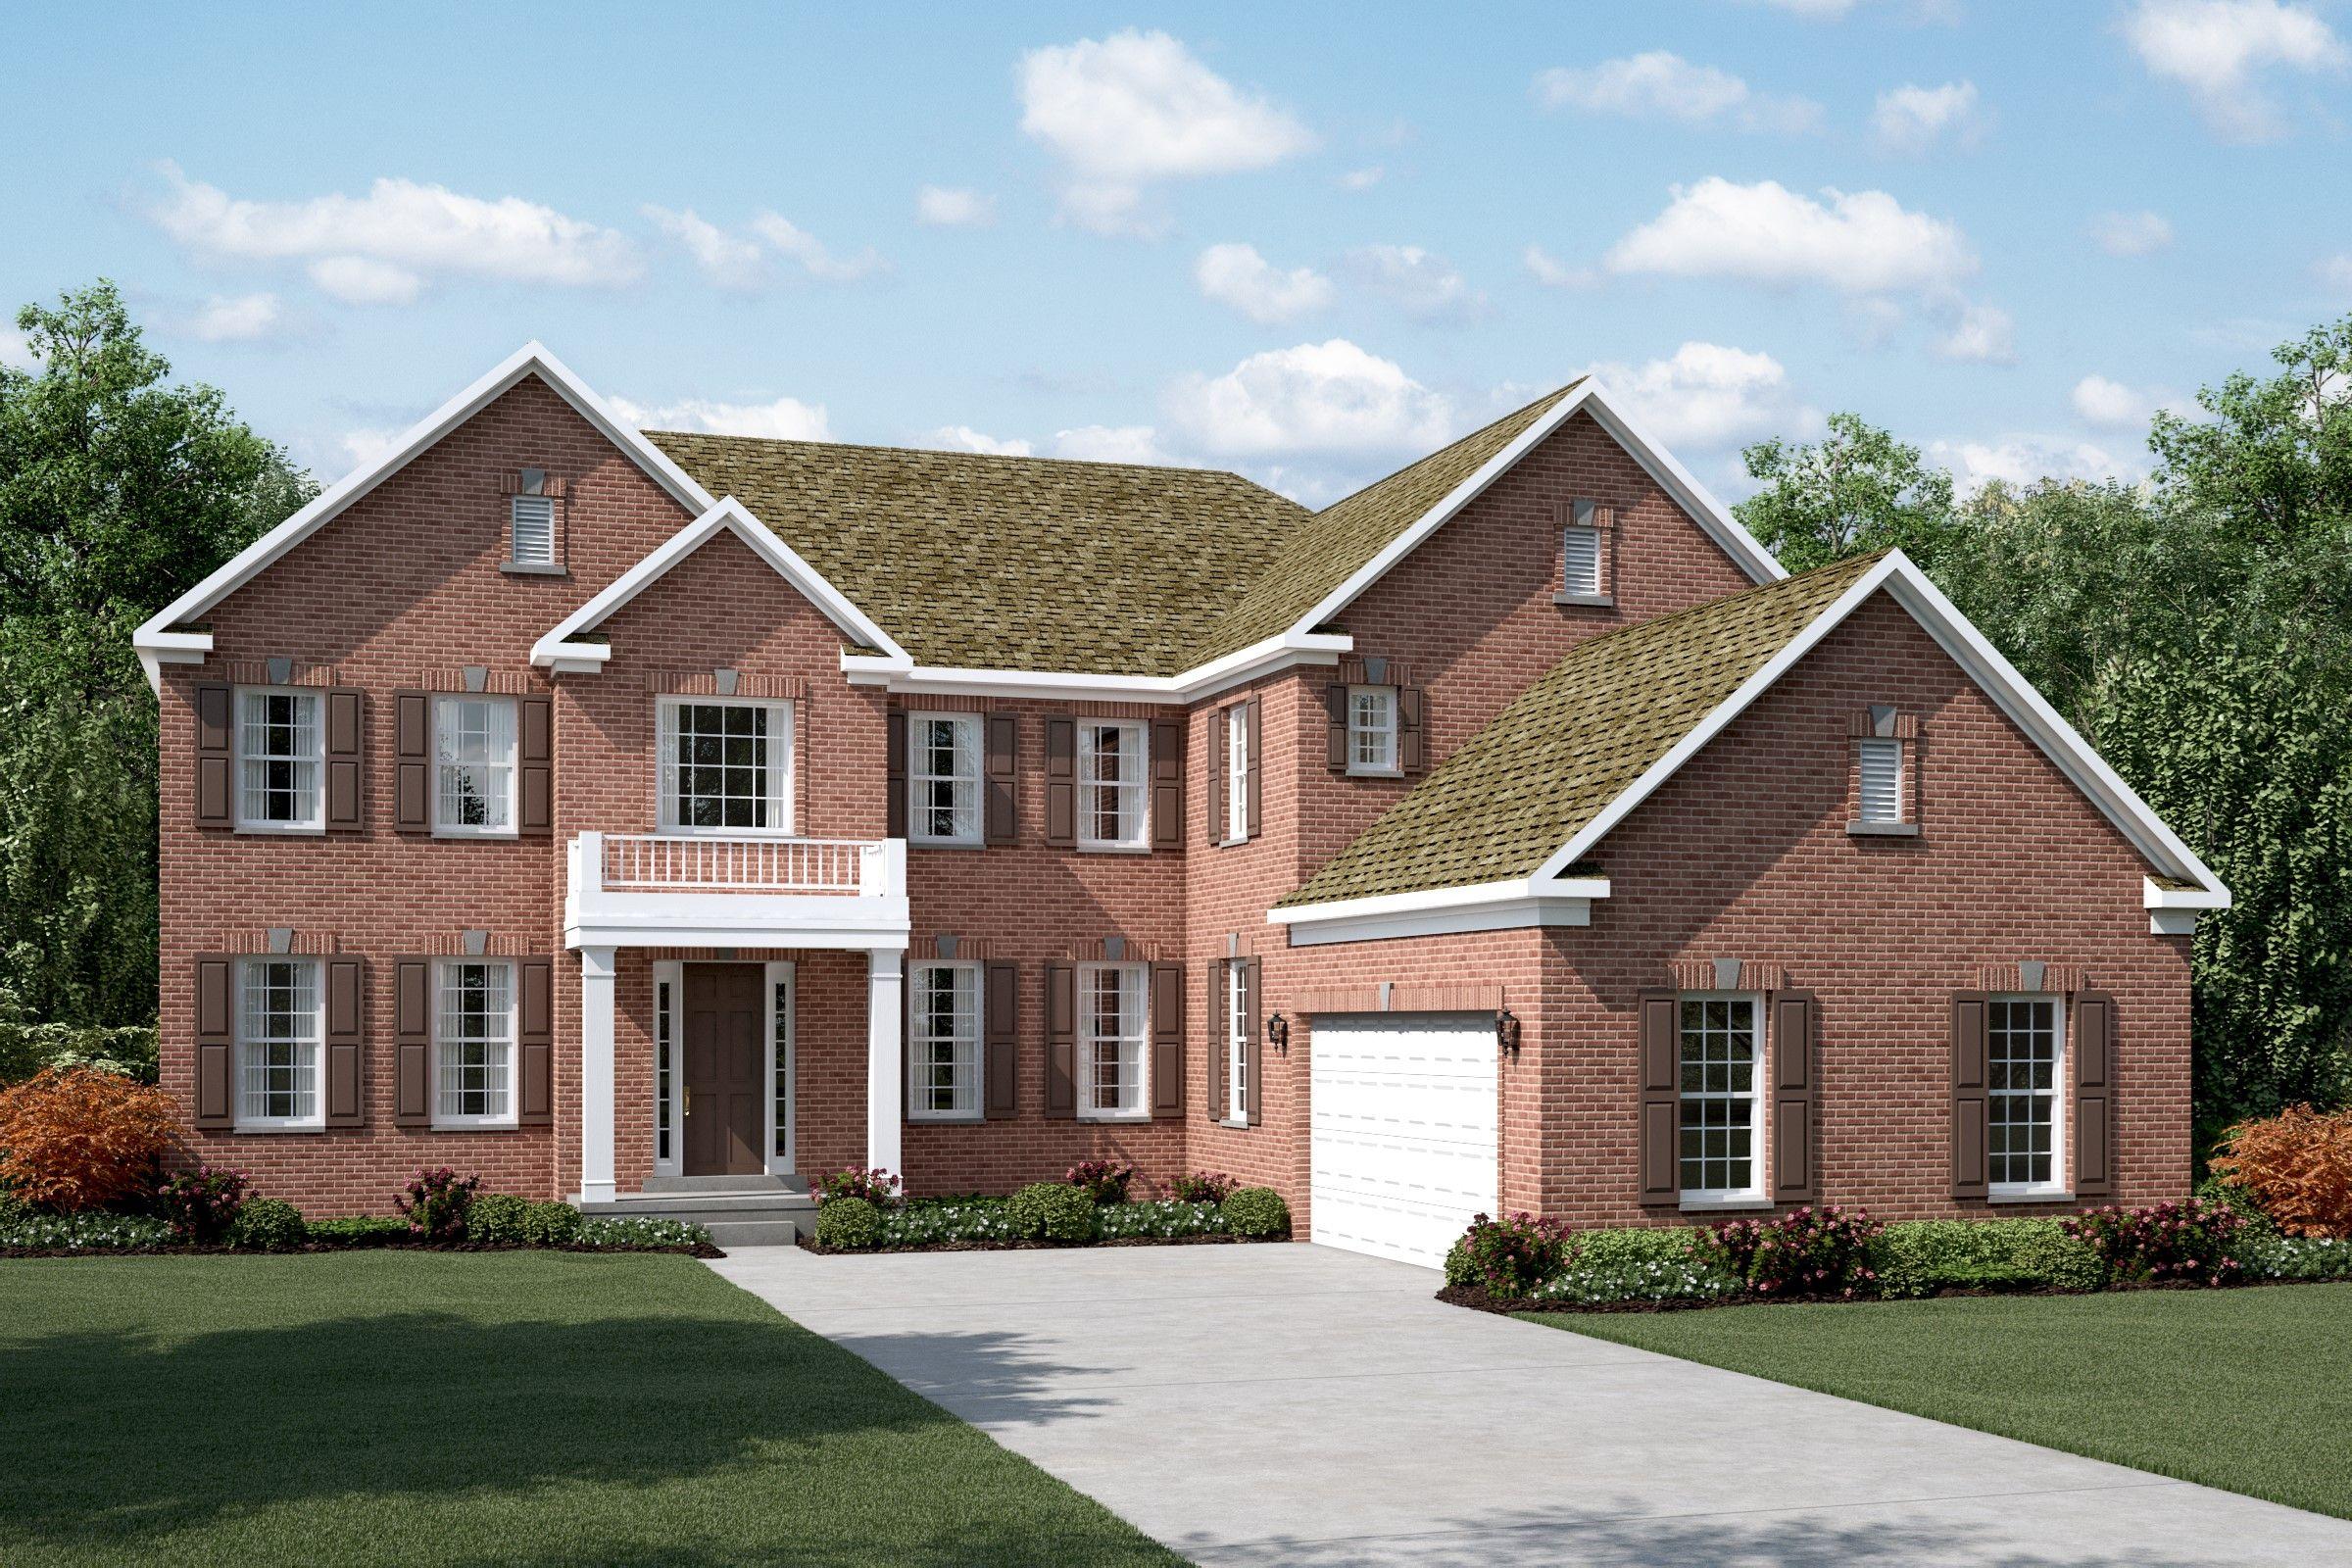 Single Family for Sale at Northridge Estates - Boulder Courtyard 1610 Falcon Drive Wheaton, Illinois 60187 United States